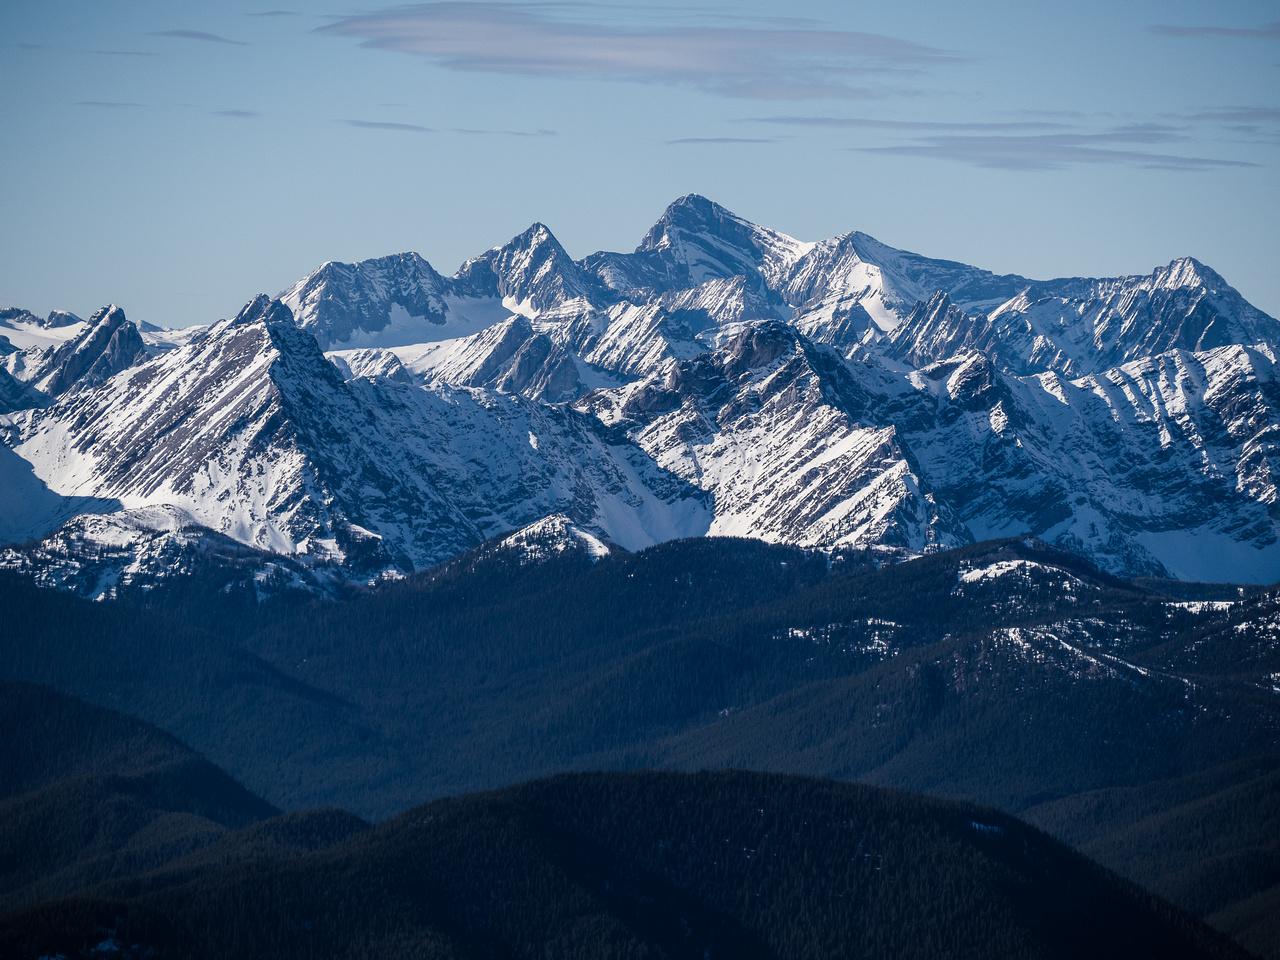 Mount Joffre and surrounding peaks including Nivelle, Ney, Castelnau, De Gaulle and McCuaig.